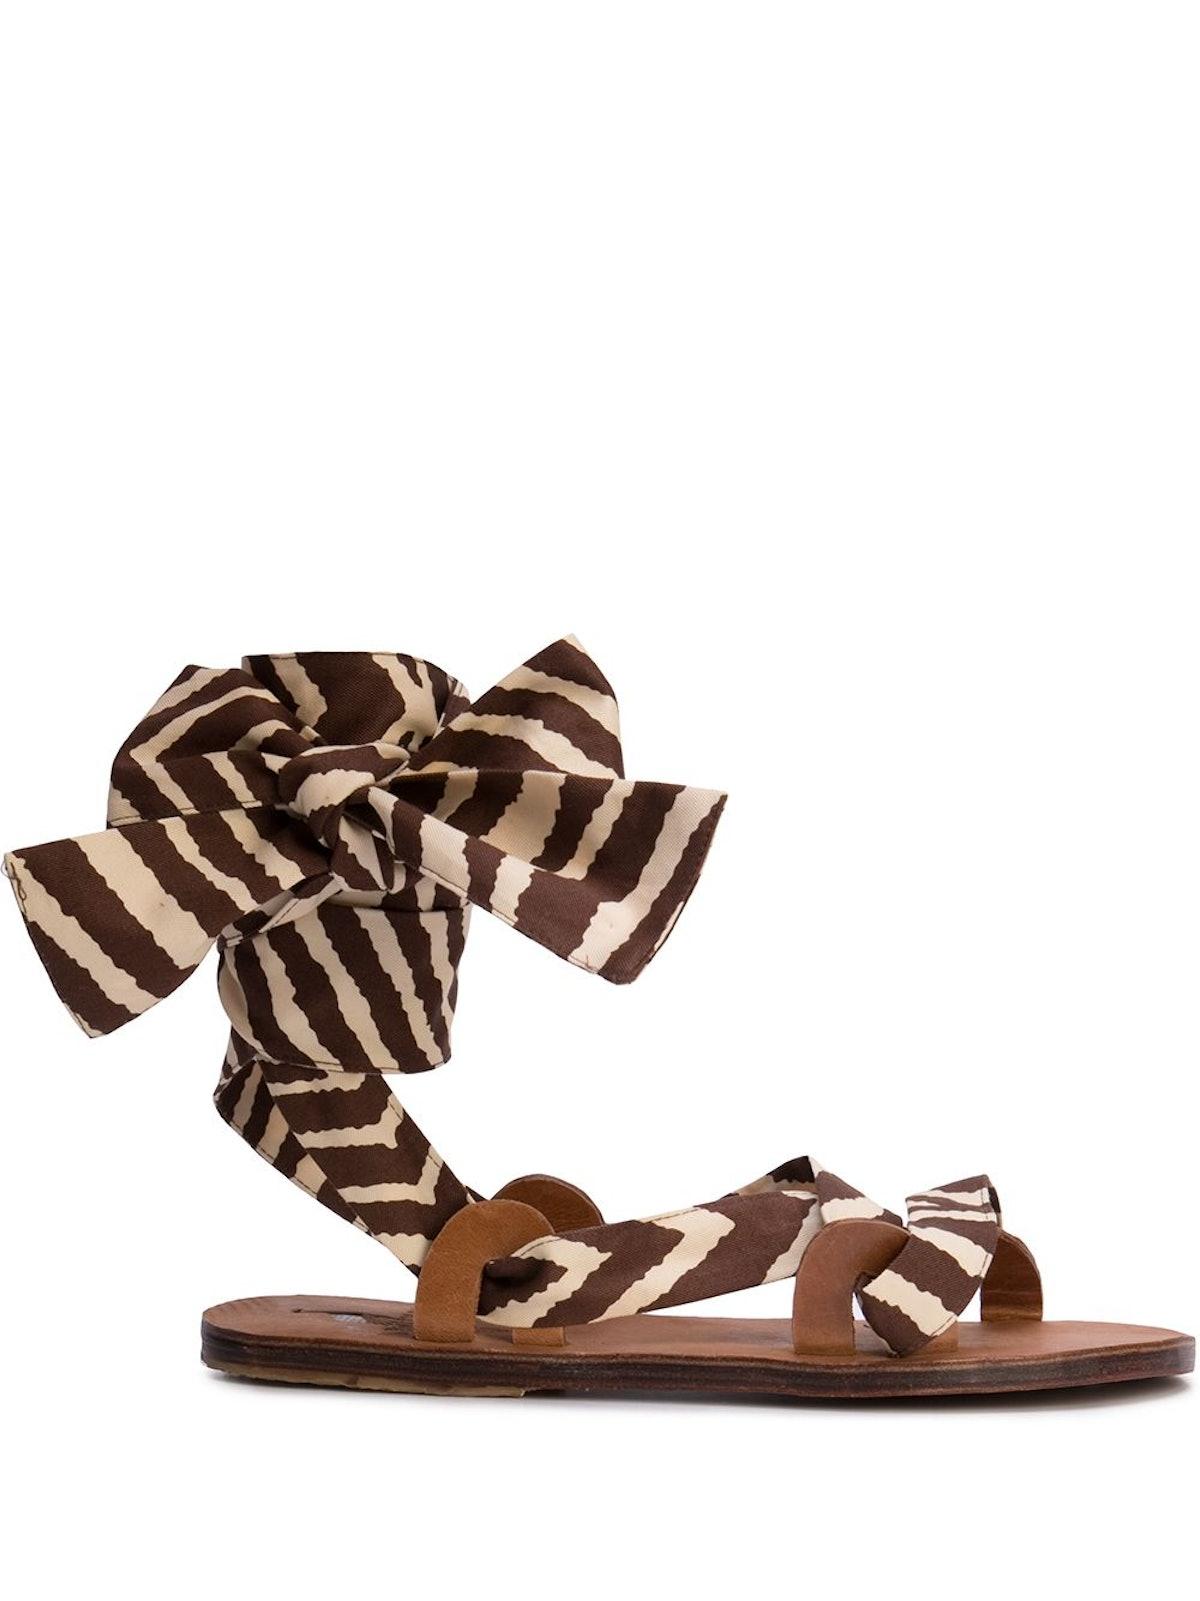 Zebra Flat Sandals